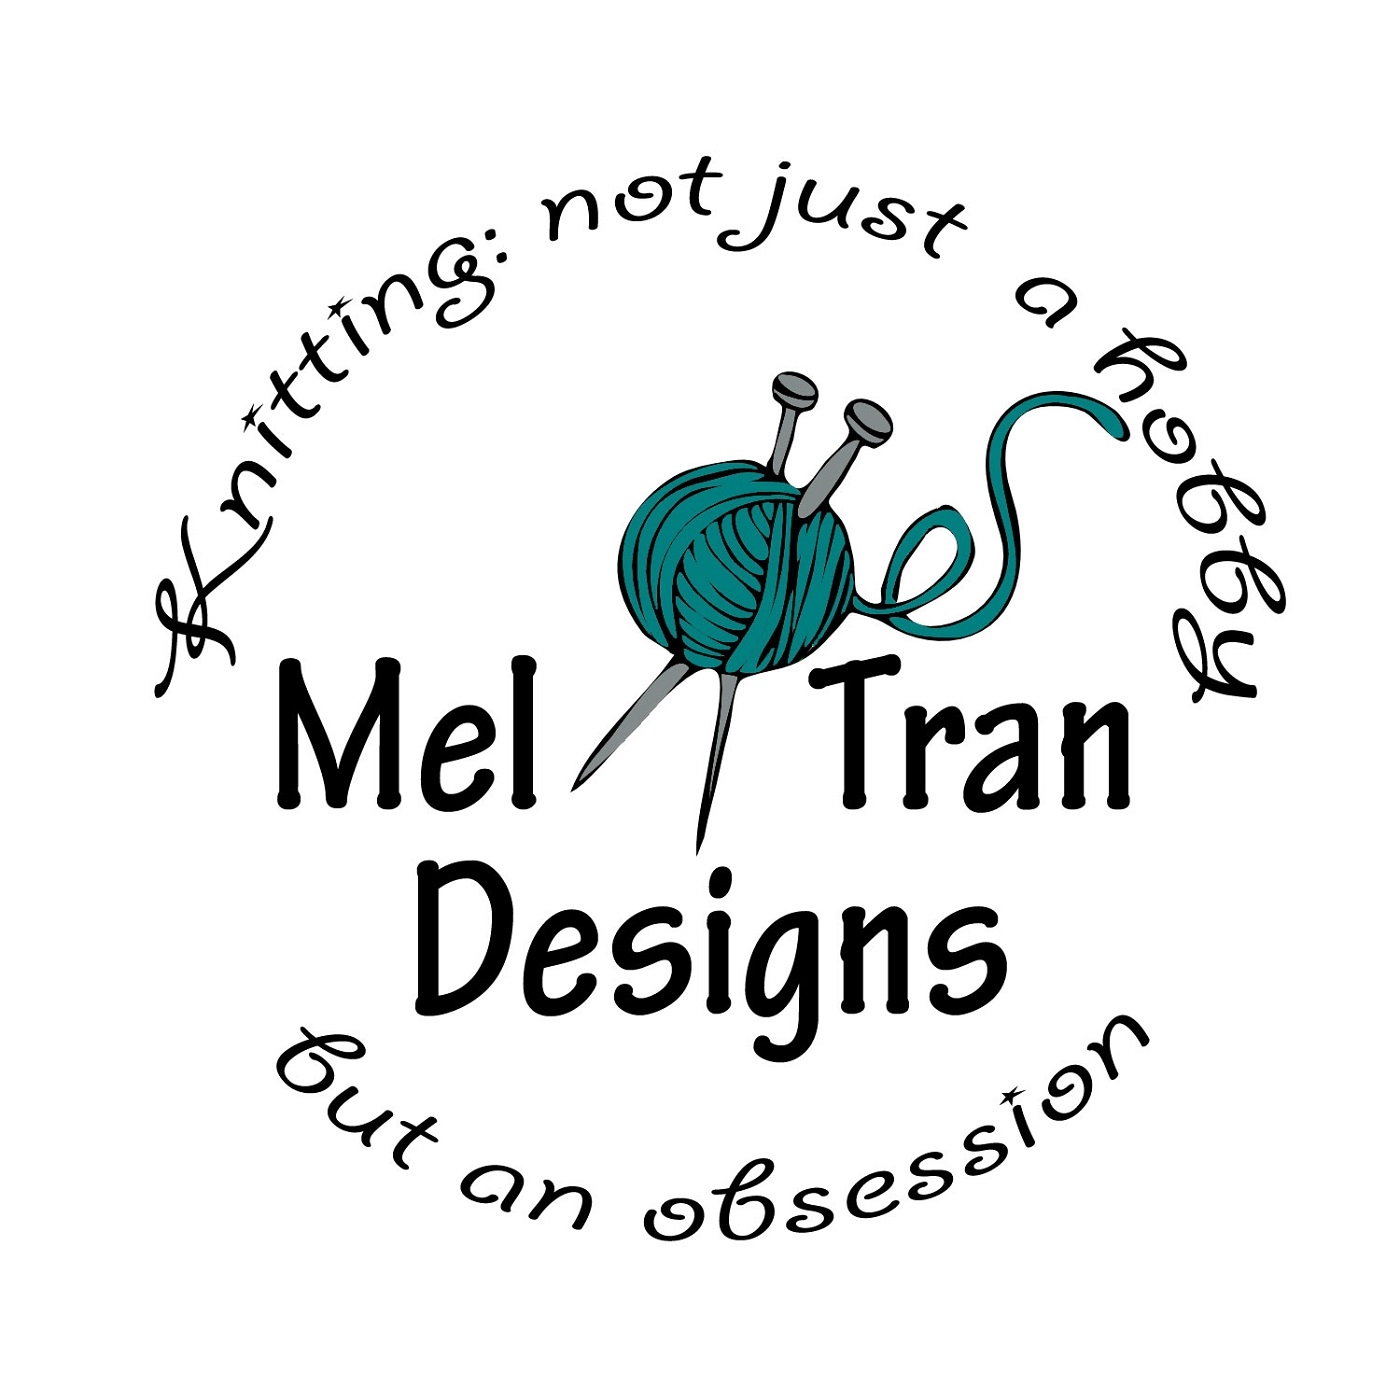 Mel-Tran Designs